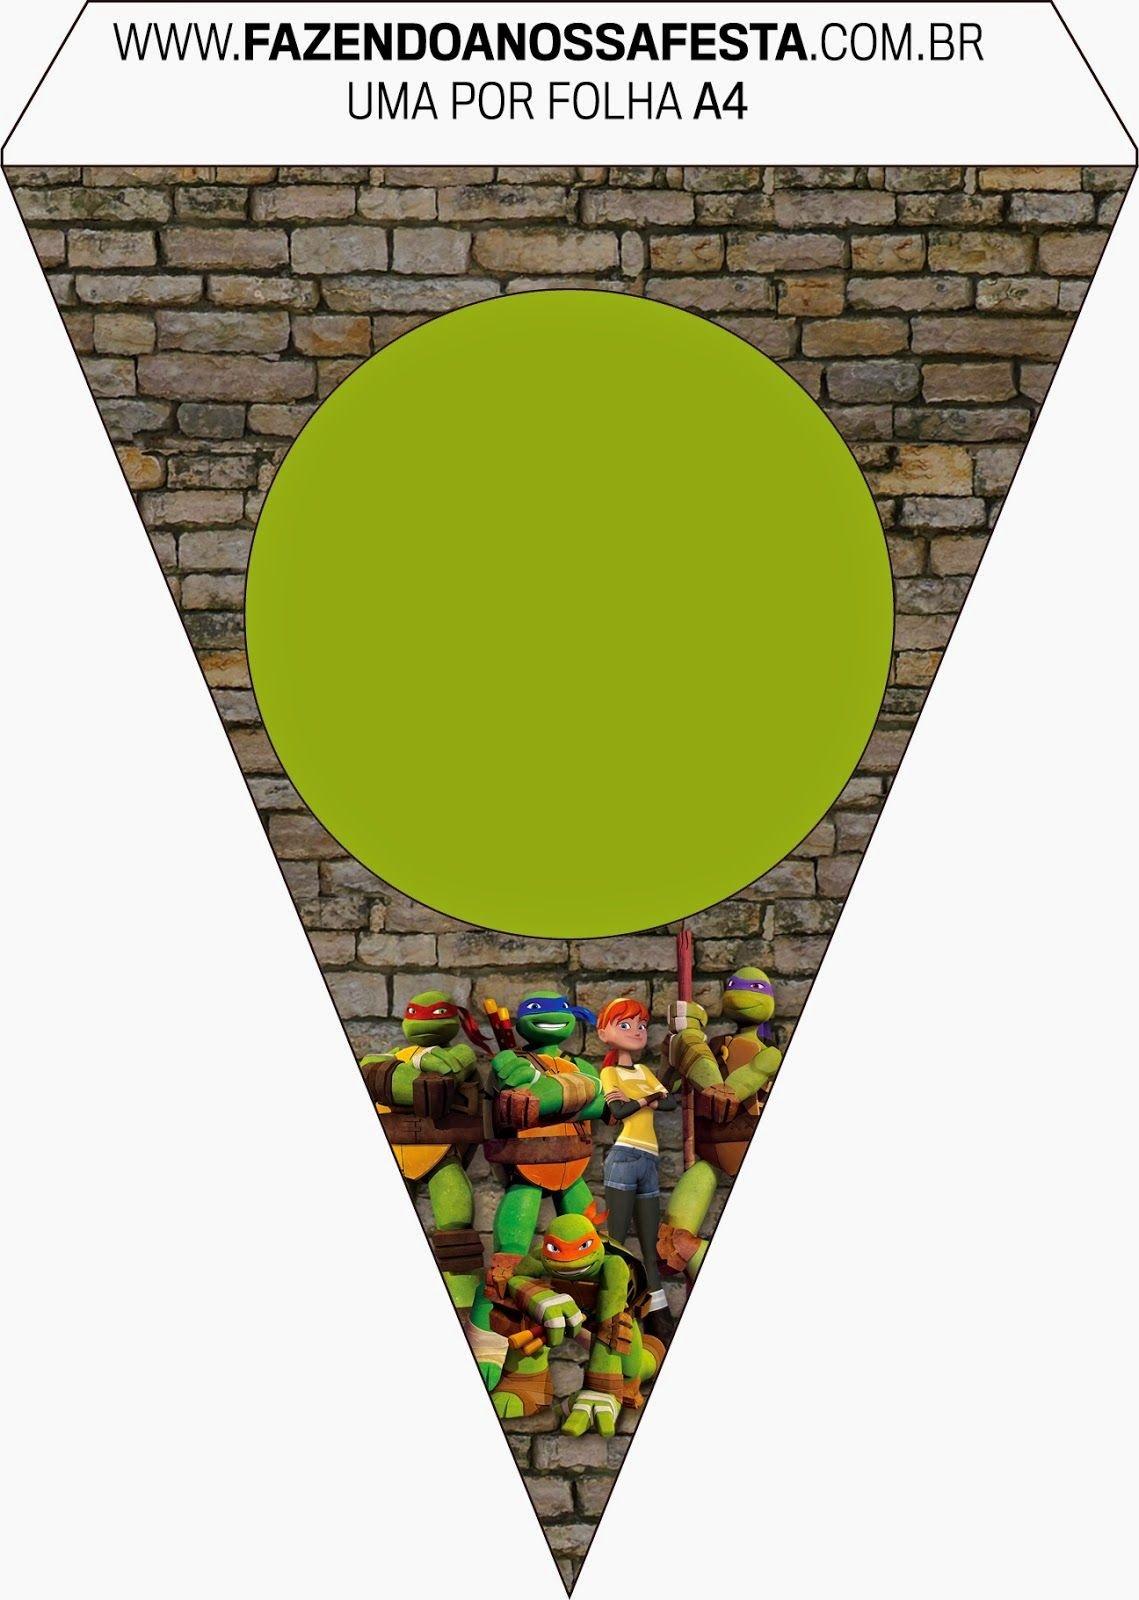 Ninja Turtles Free Party Printables And Invitations. | Event - Free Printable Ninja Turtle Birthday Banner